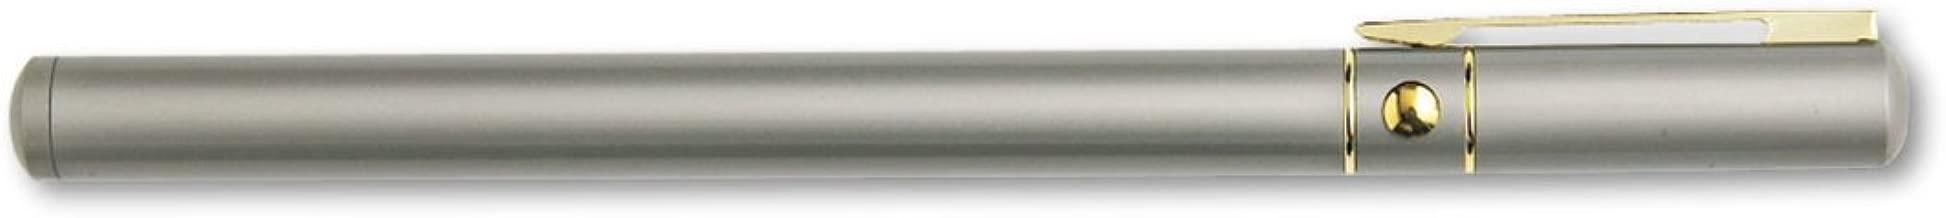 Quartet MP1350Q Executive Laser Pointer, Class 3A, Projects 500 yds, Matte Silver